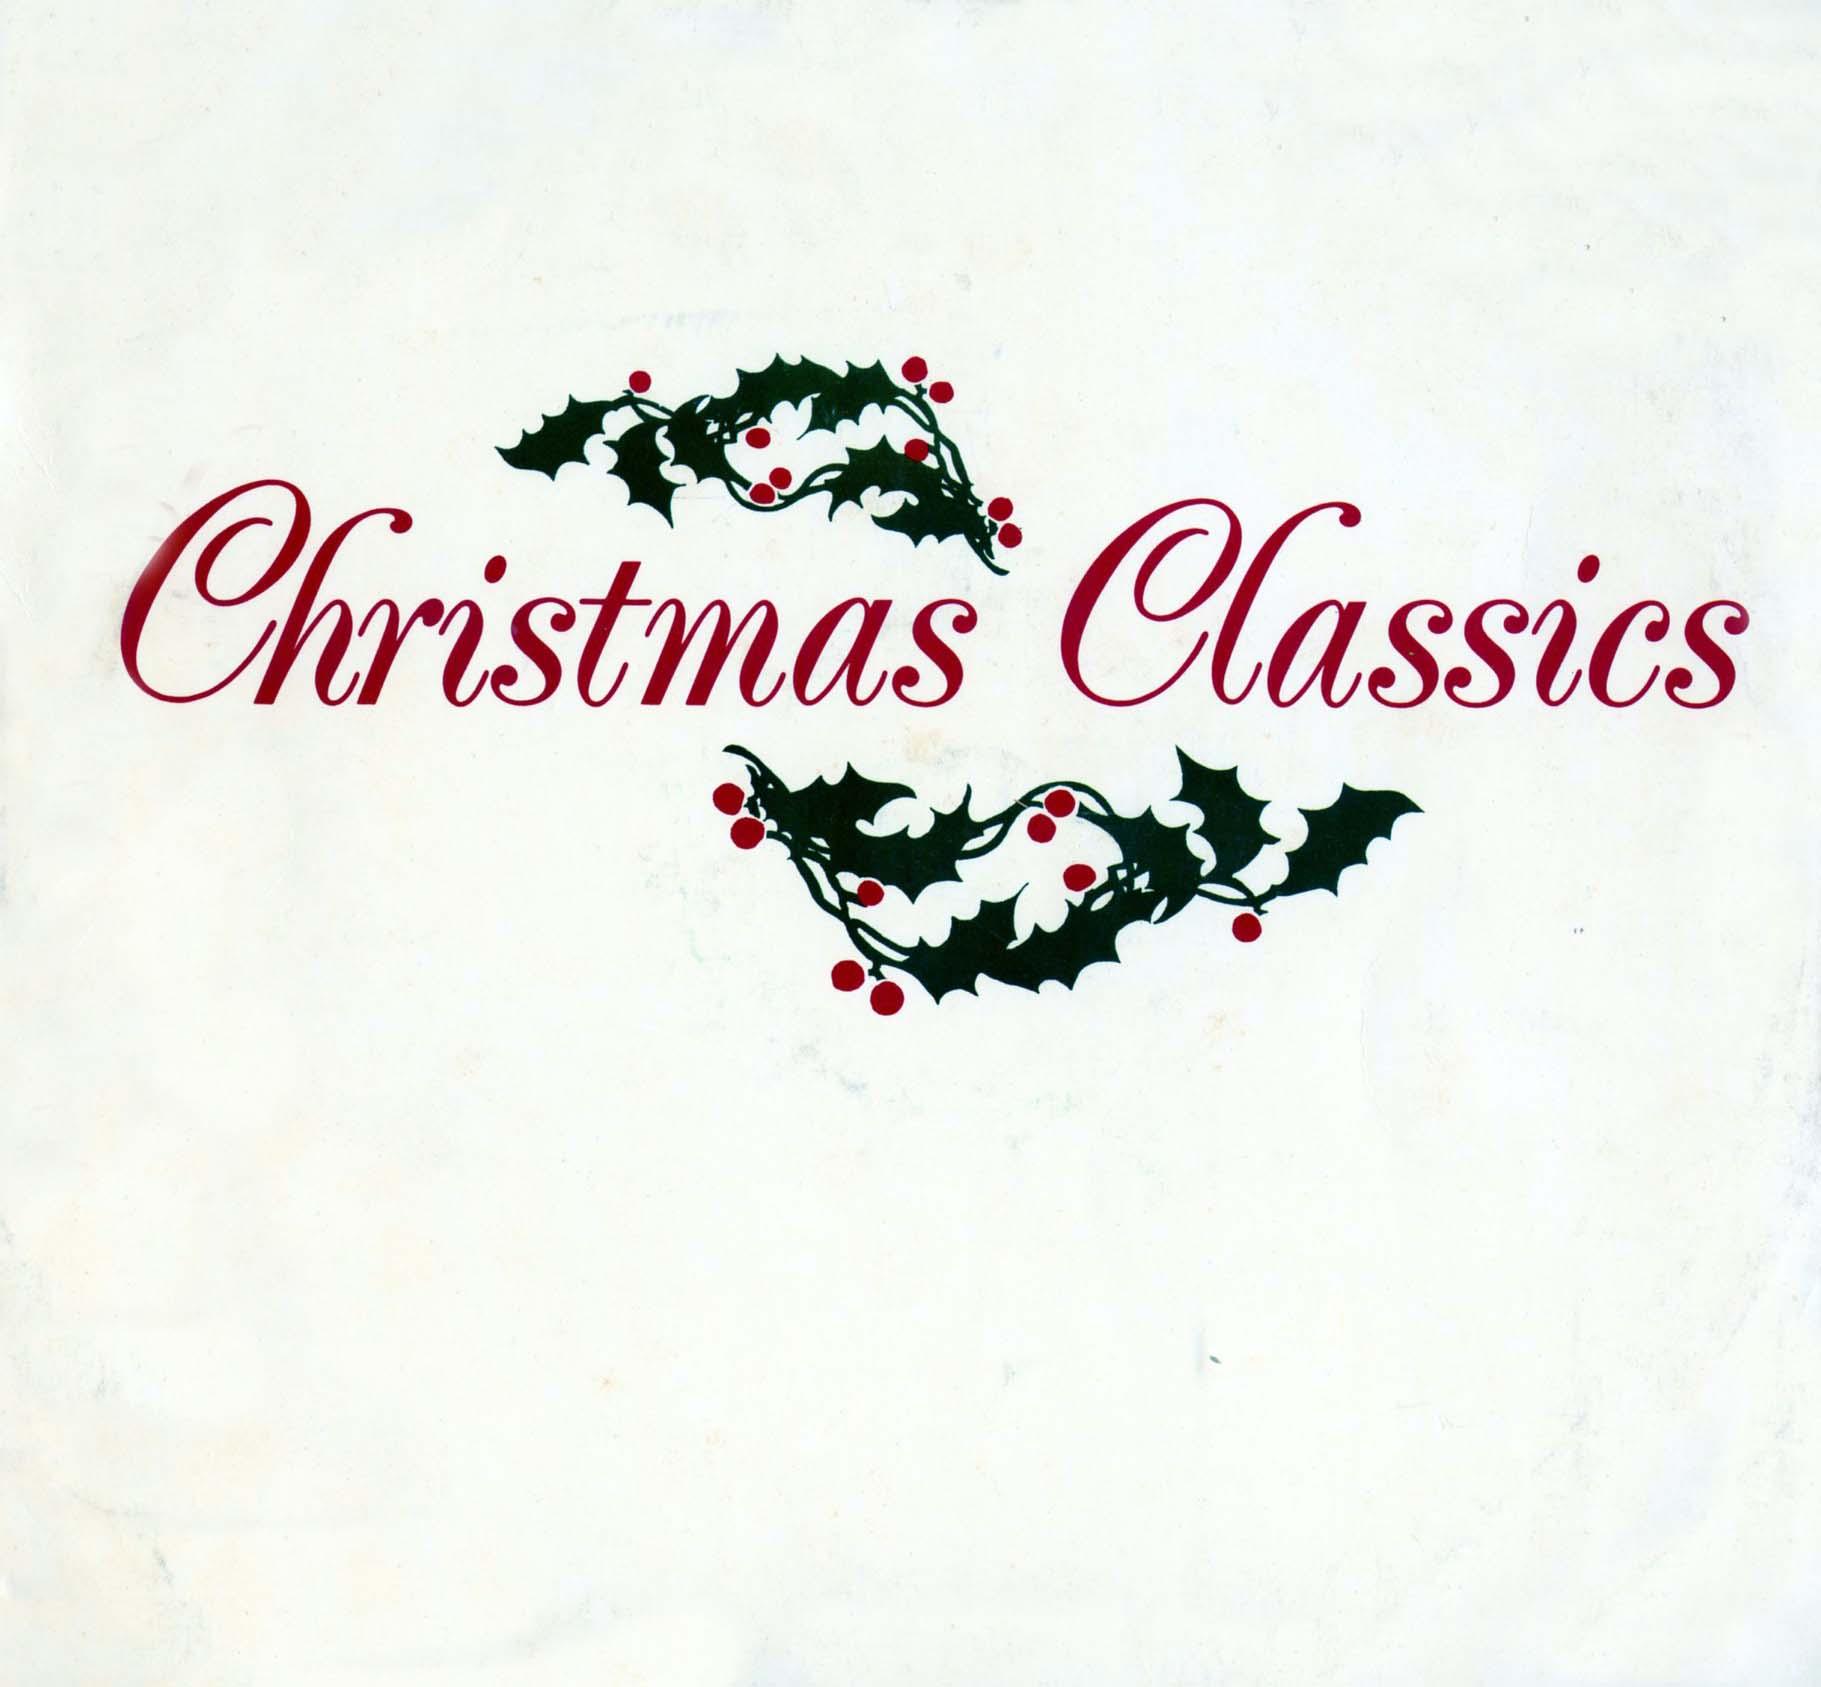 cd christmas classics - Christmas Classics